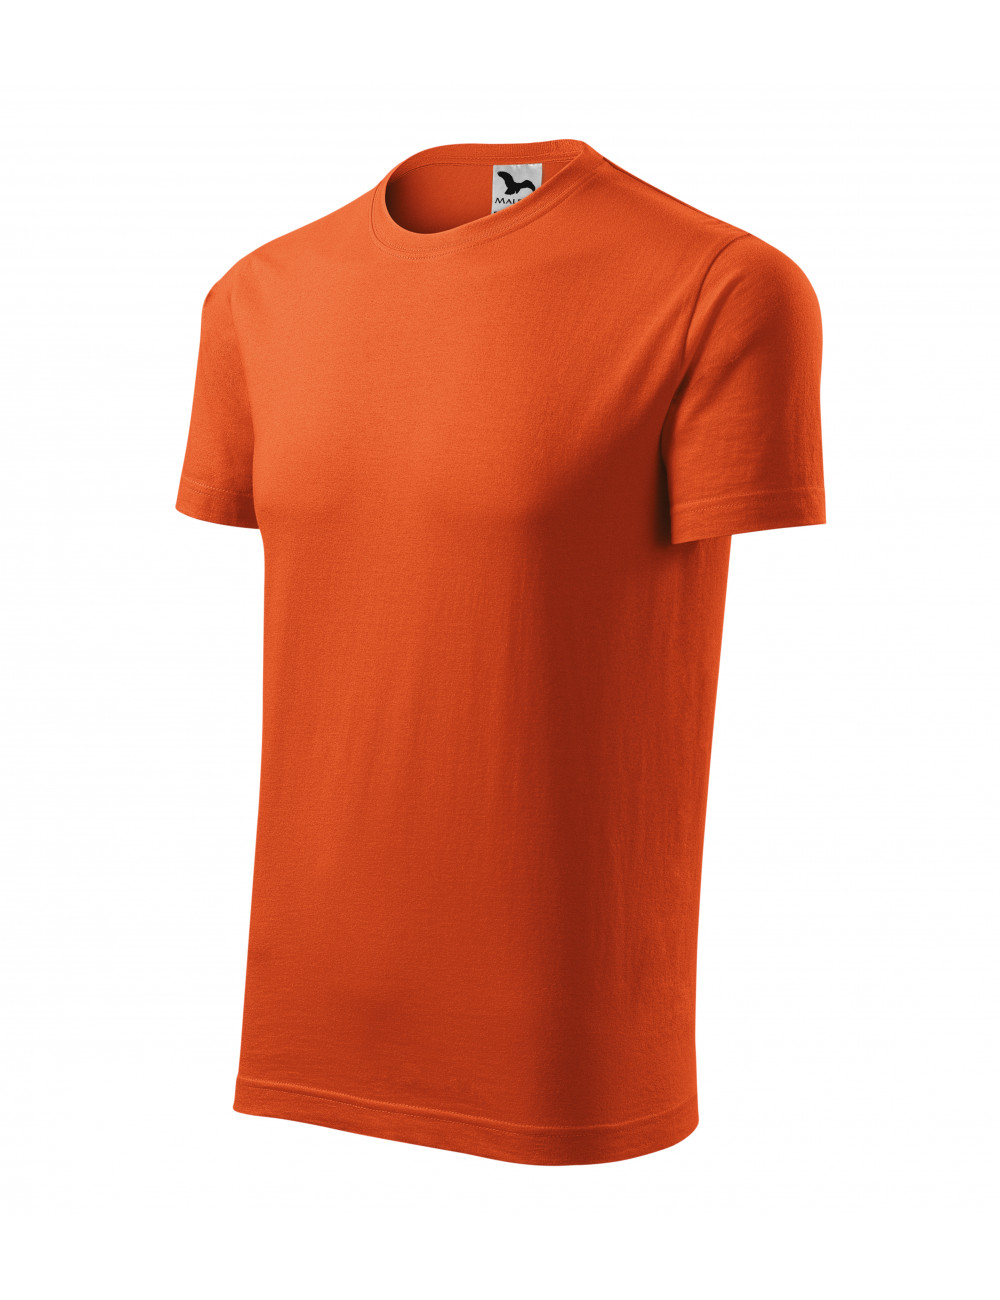 Adler MALFINI Koszulka unisex Element 145 pomarańczowy